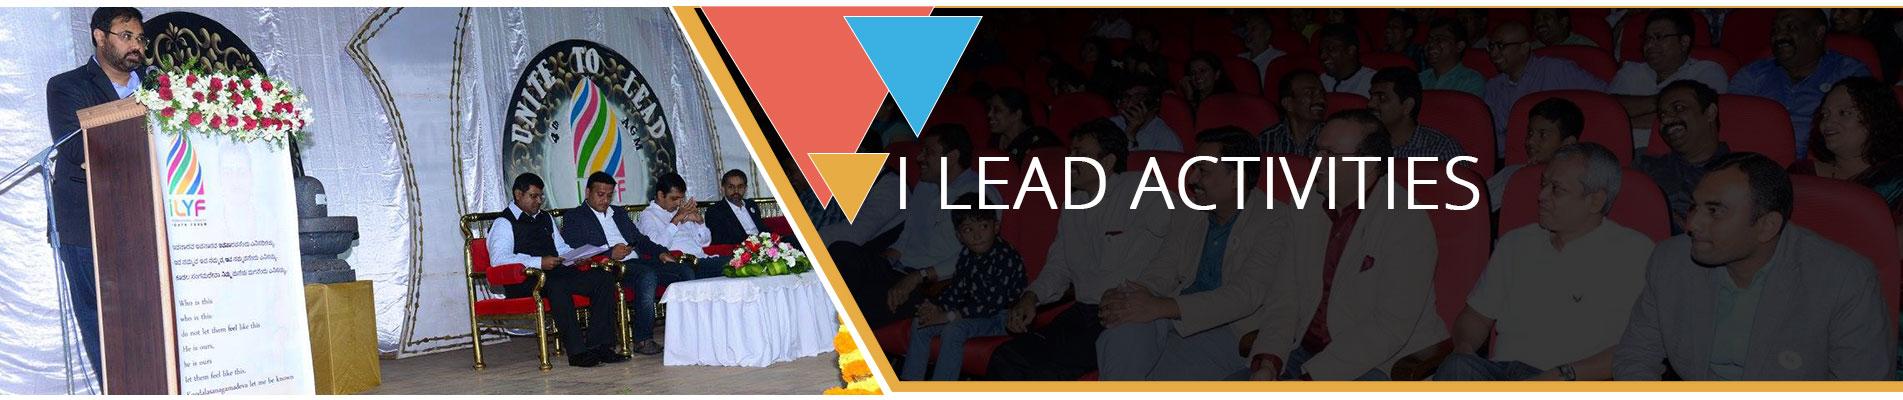 I-Lead Activities